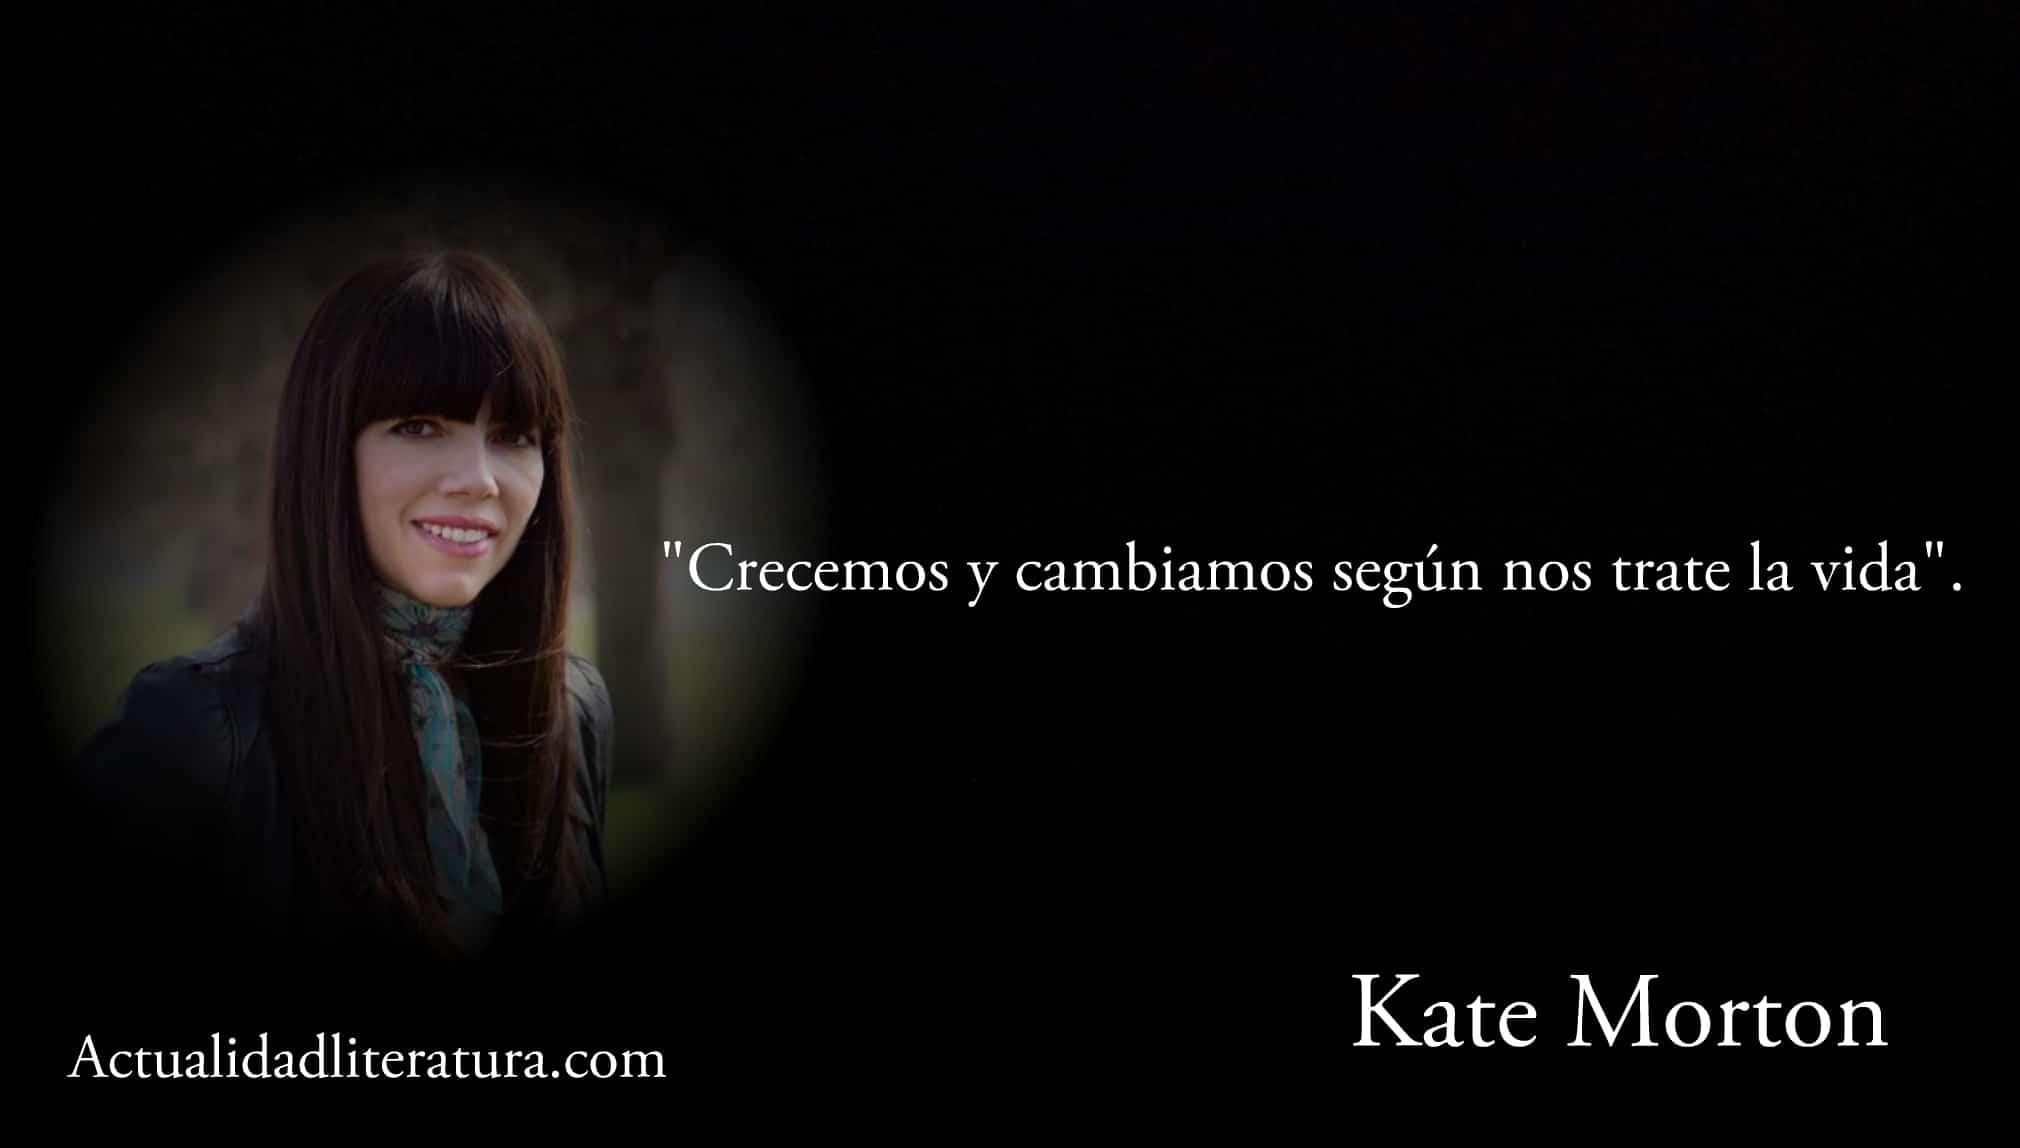 Frase de Kate Morton.